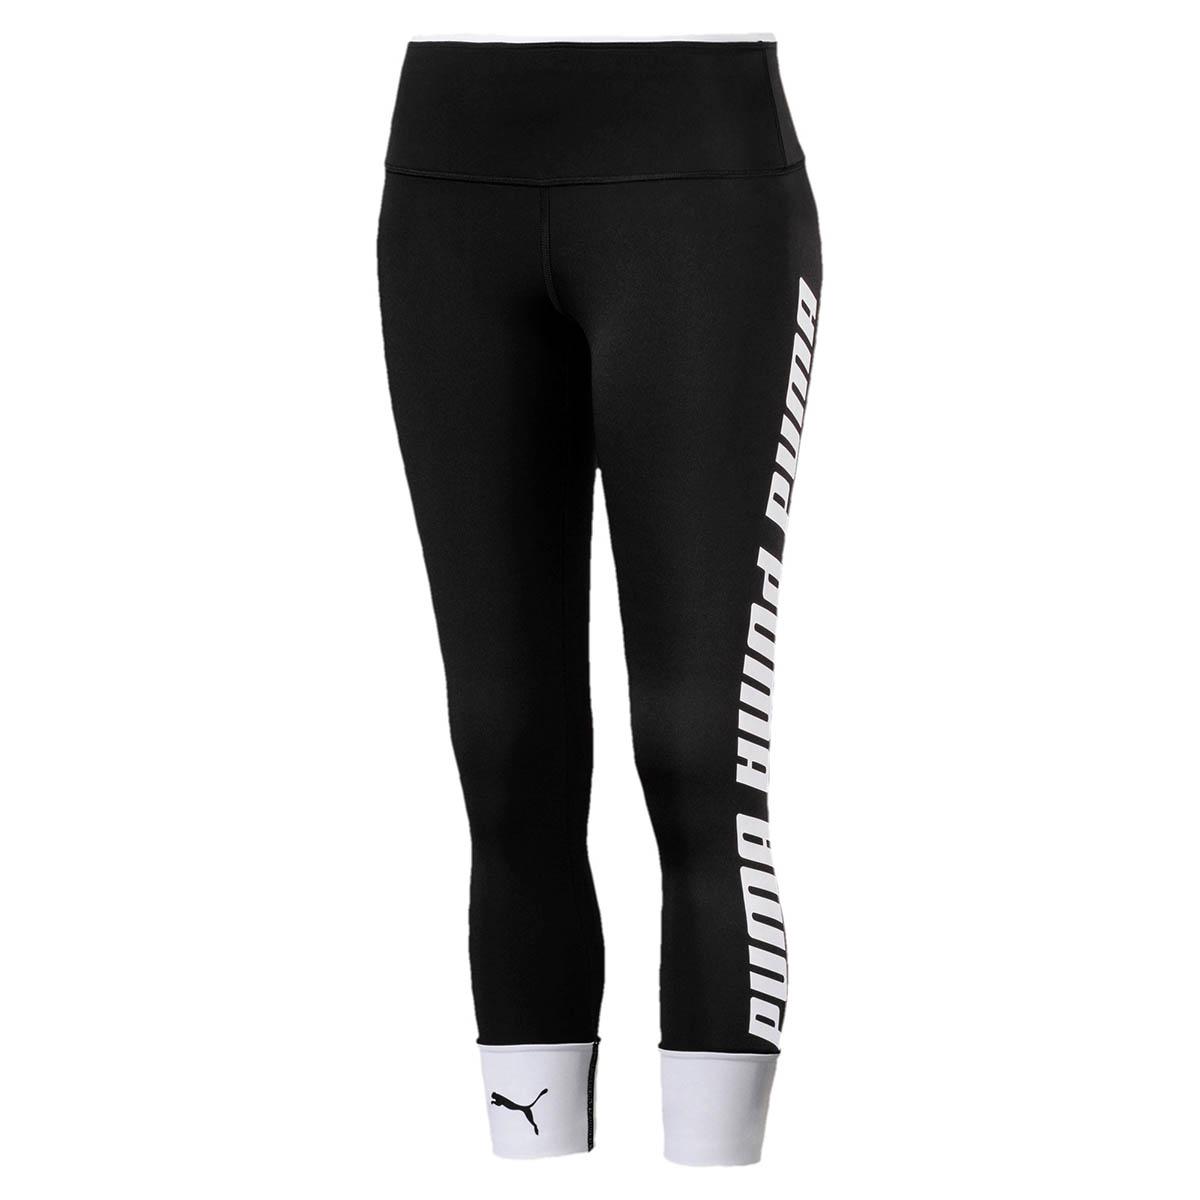 Hosen - PUMA Modern Sports FoldUp Leggings Pant Hose Pants Fitnesshose Schwarz 854243 XS  - Onlineshop Sneakerprofi